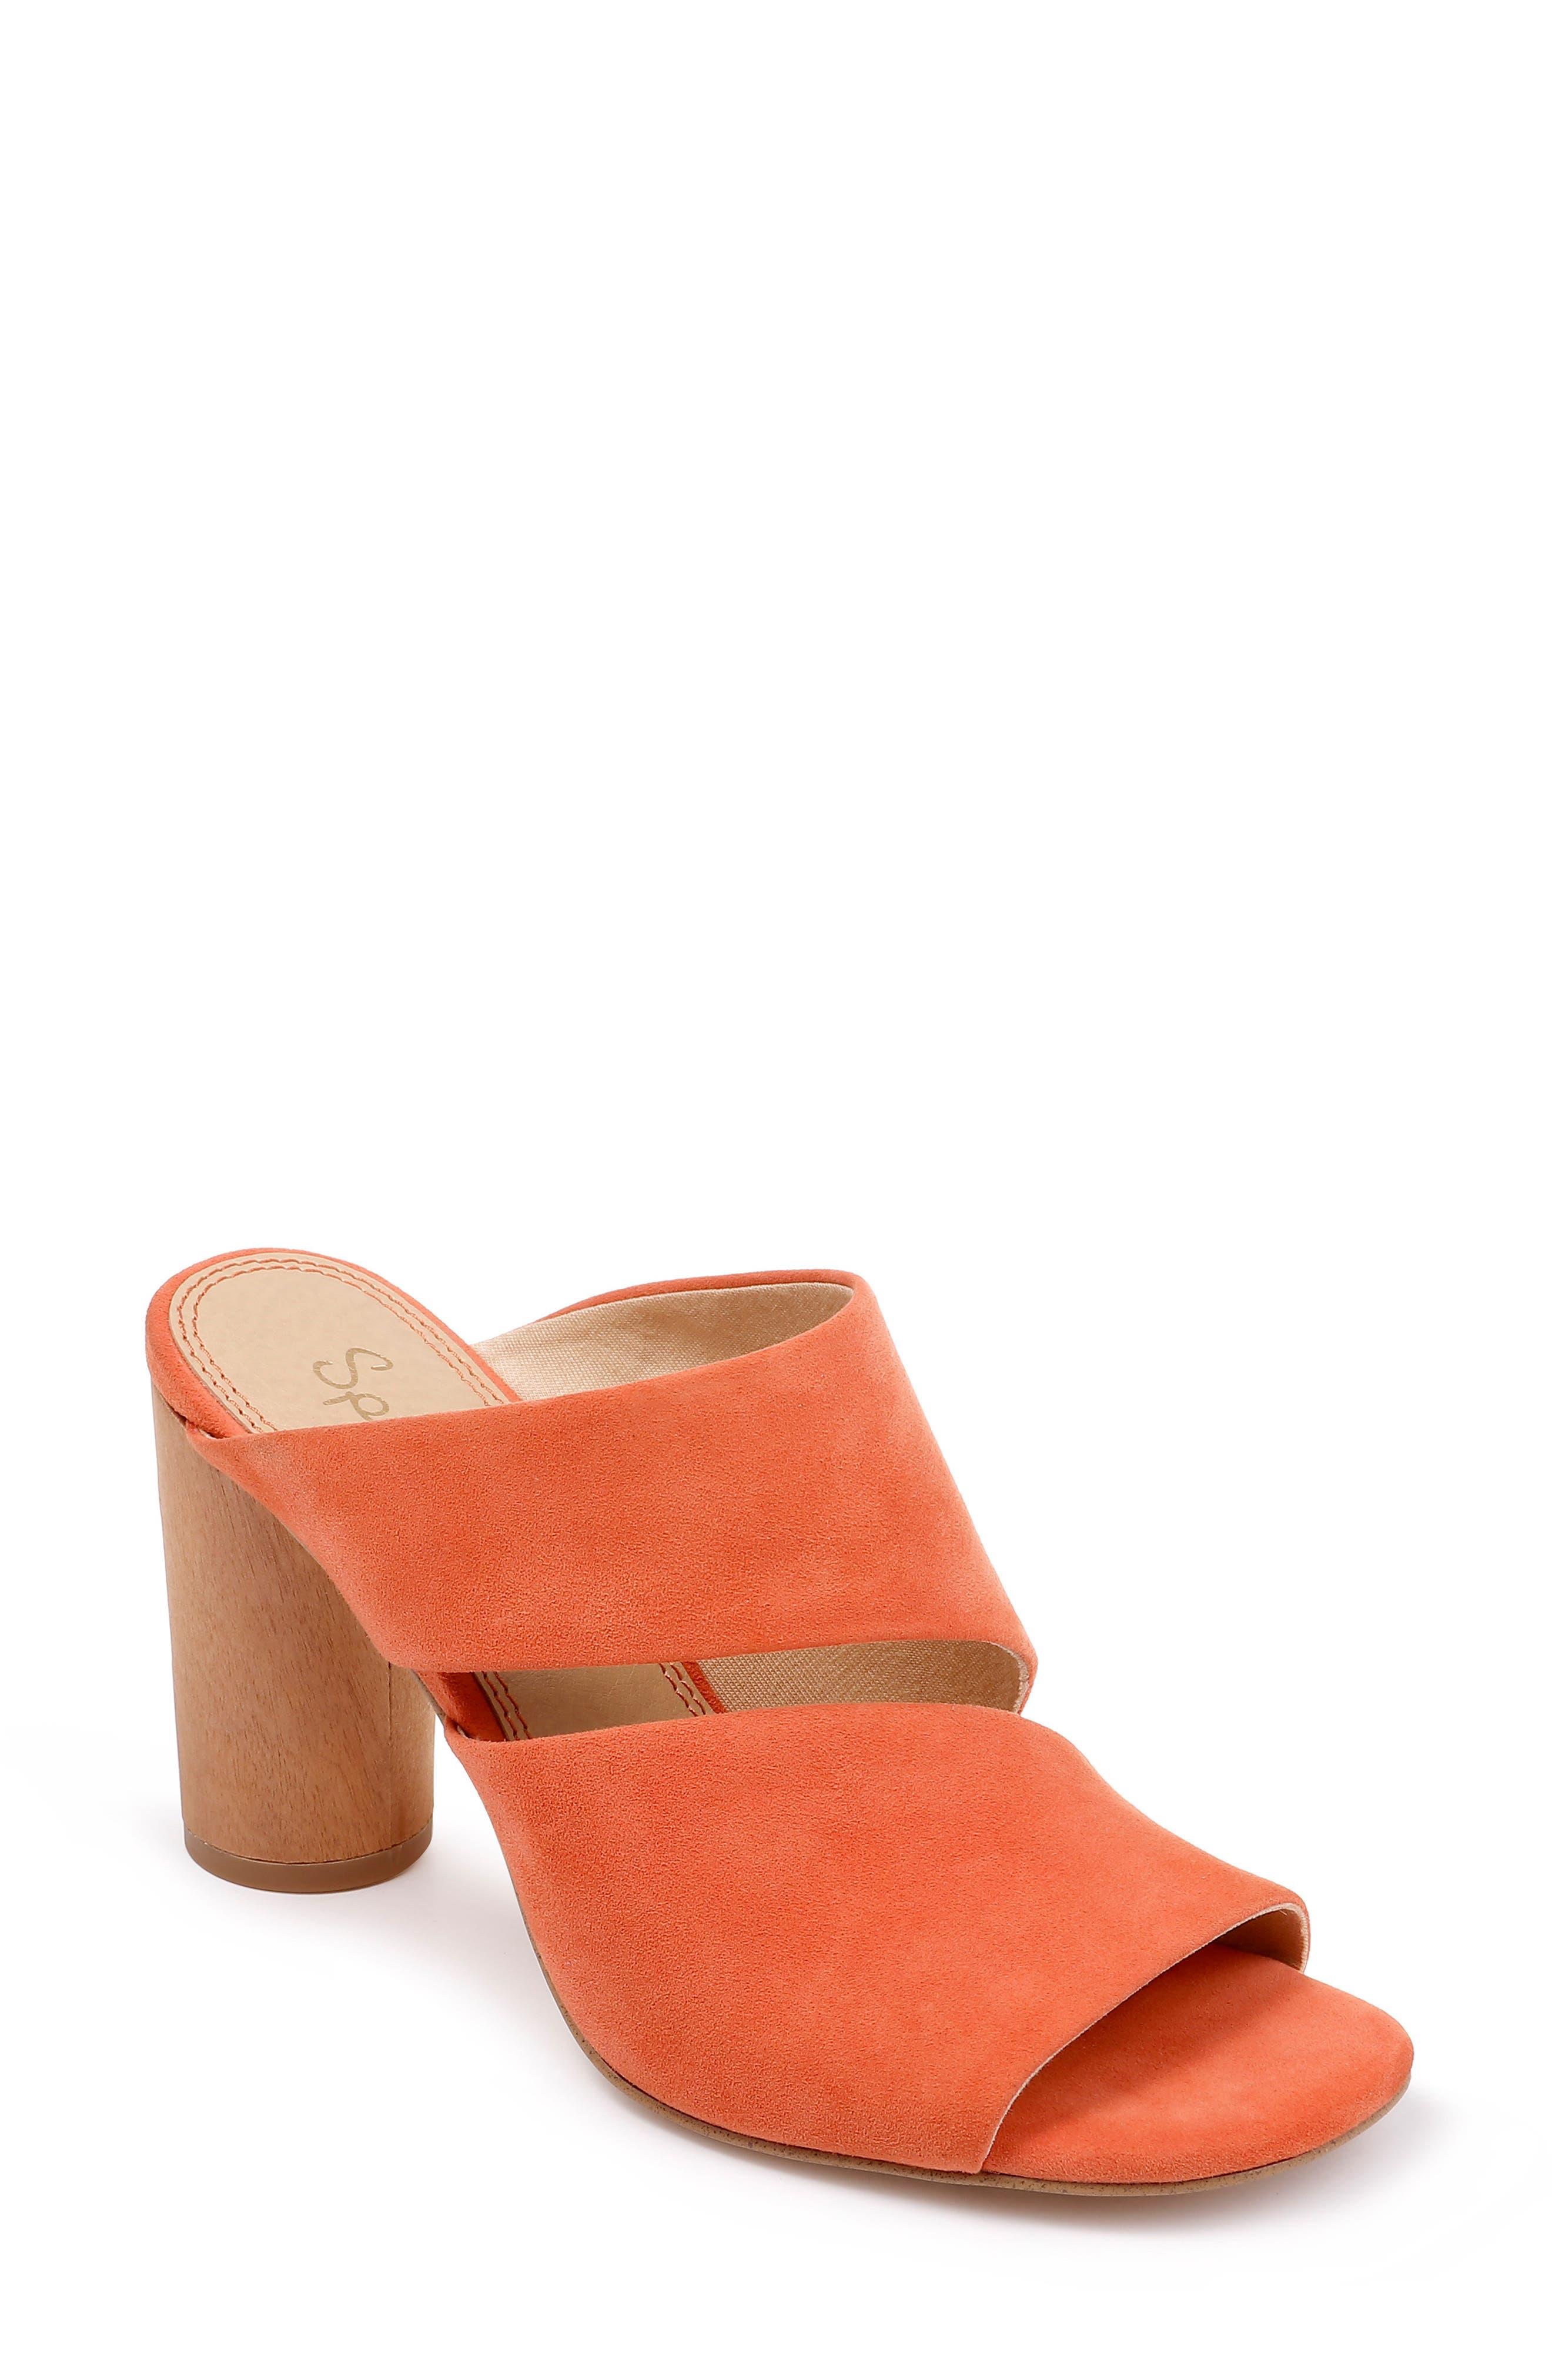 SPLENDID Serenade Sandal, Main, color, ORANGE SUEDE